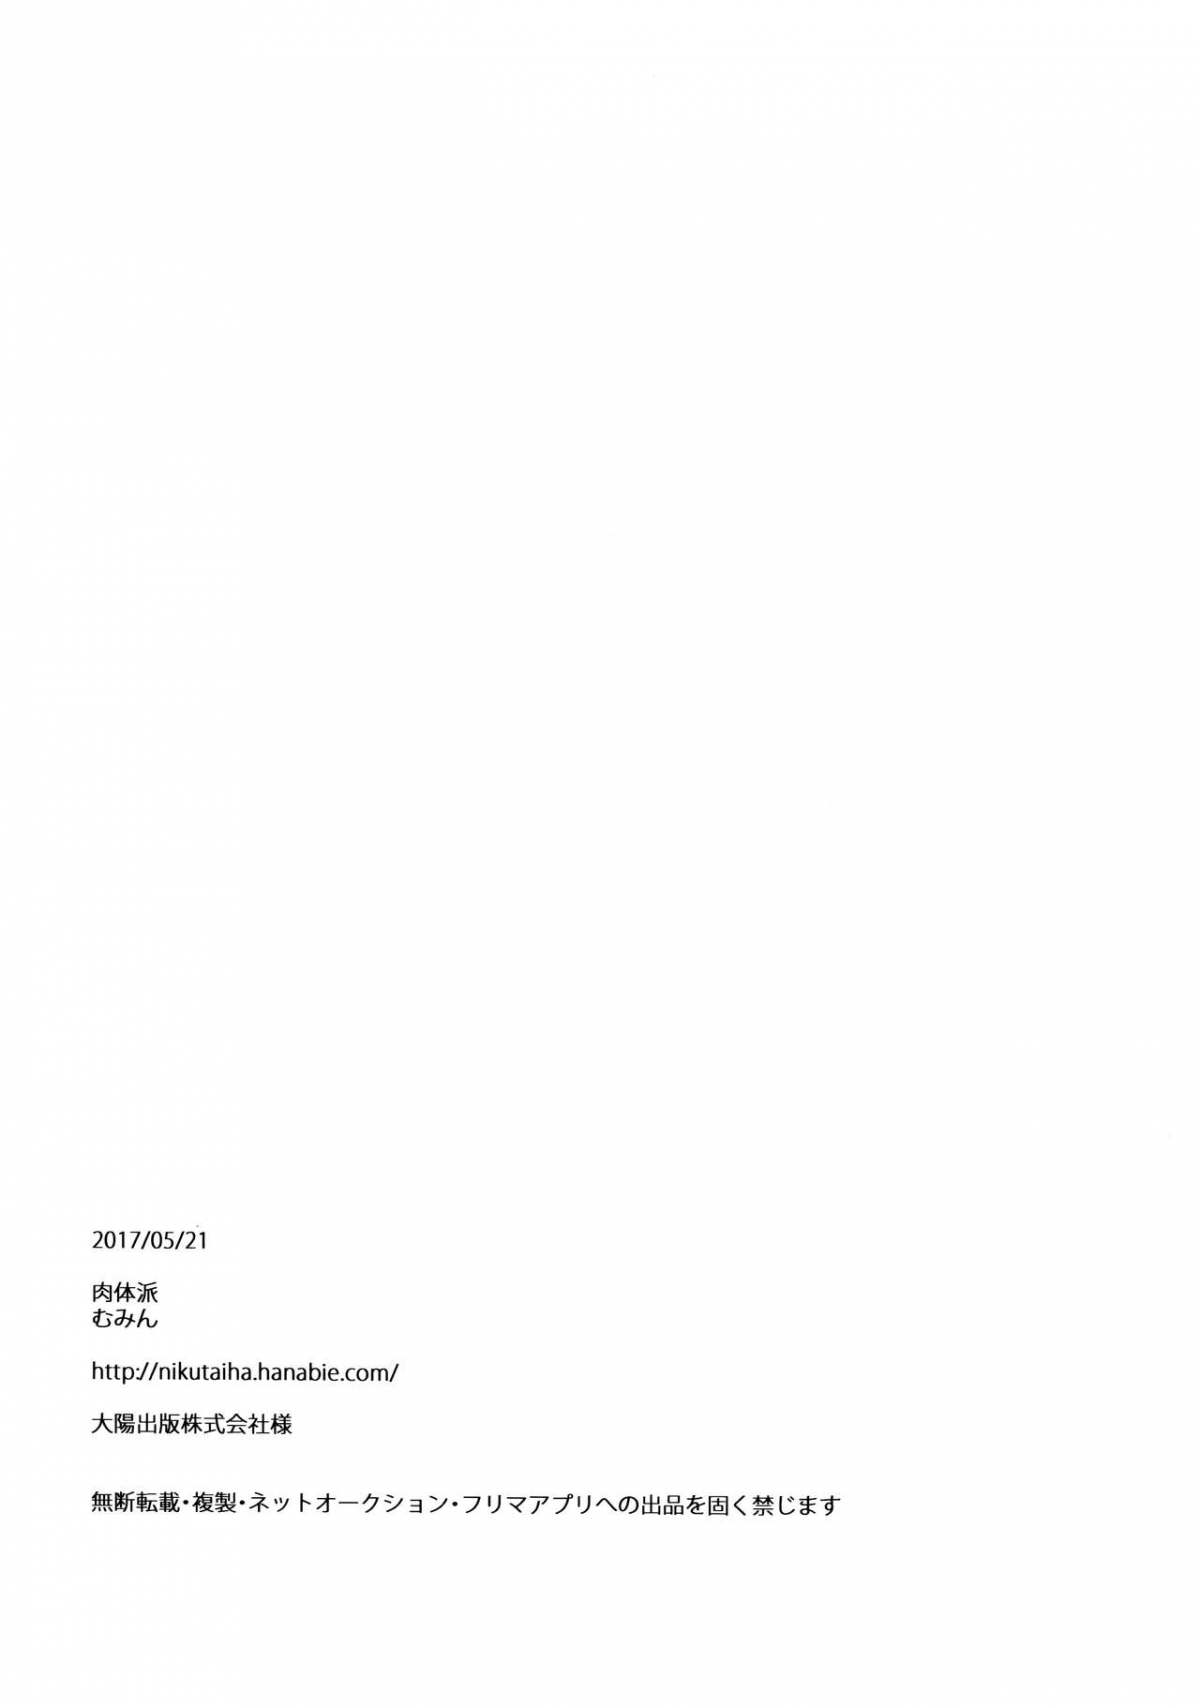 HentaiVN.net - Ảnh 19 - Yurari Oboreru Temptation (Collar x Malice) - Oneshot